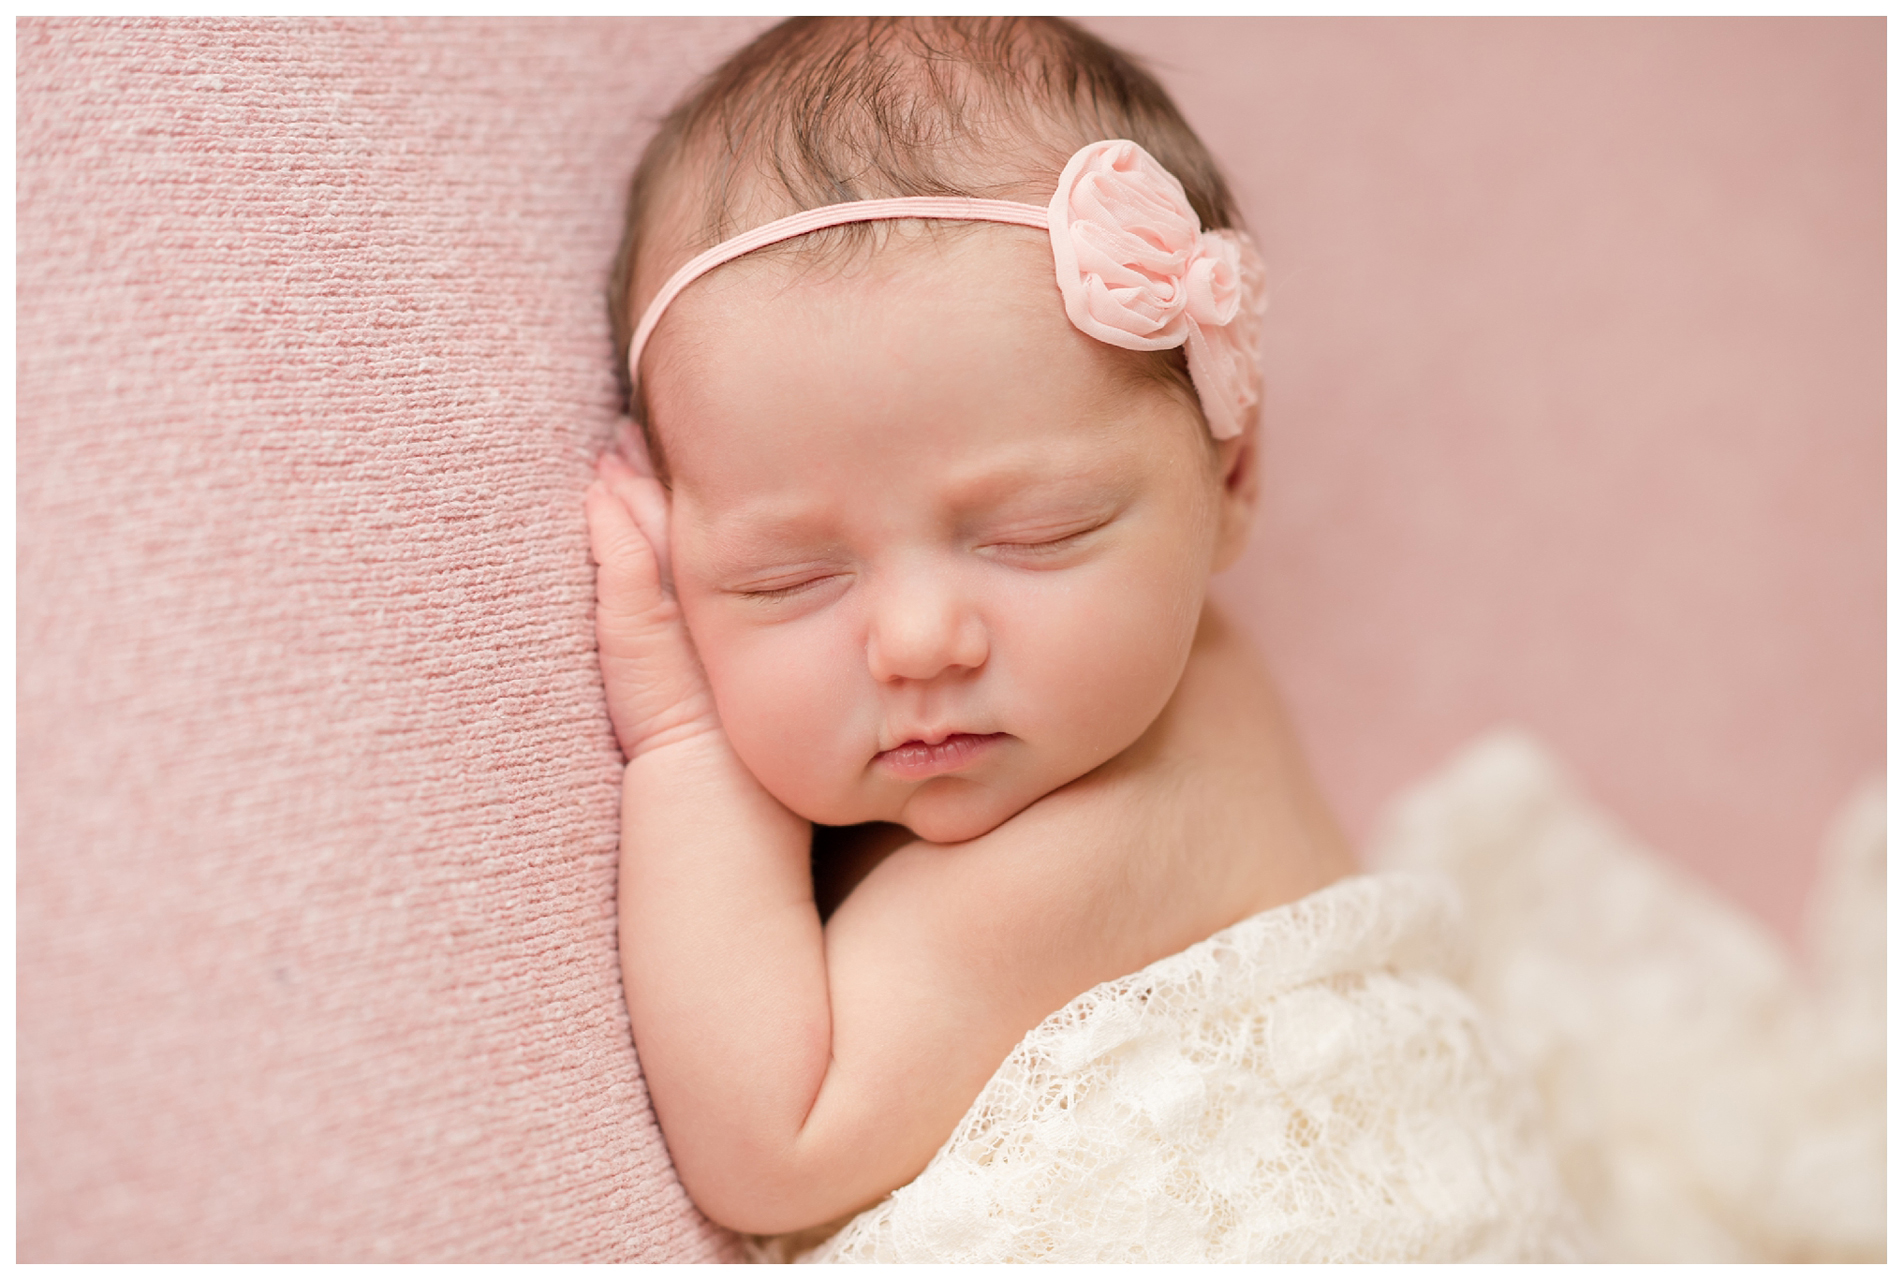 Newborn-Photographer-Sweet-Light-Portraits11.jpg